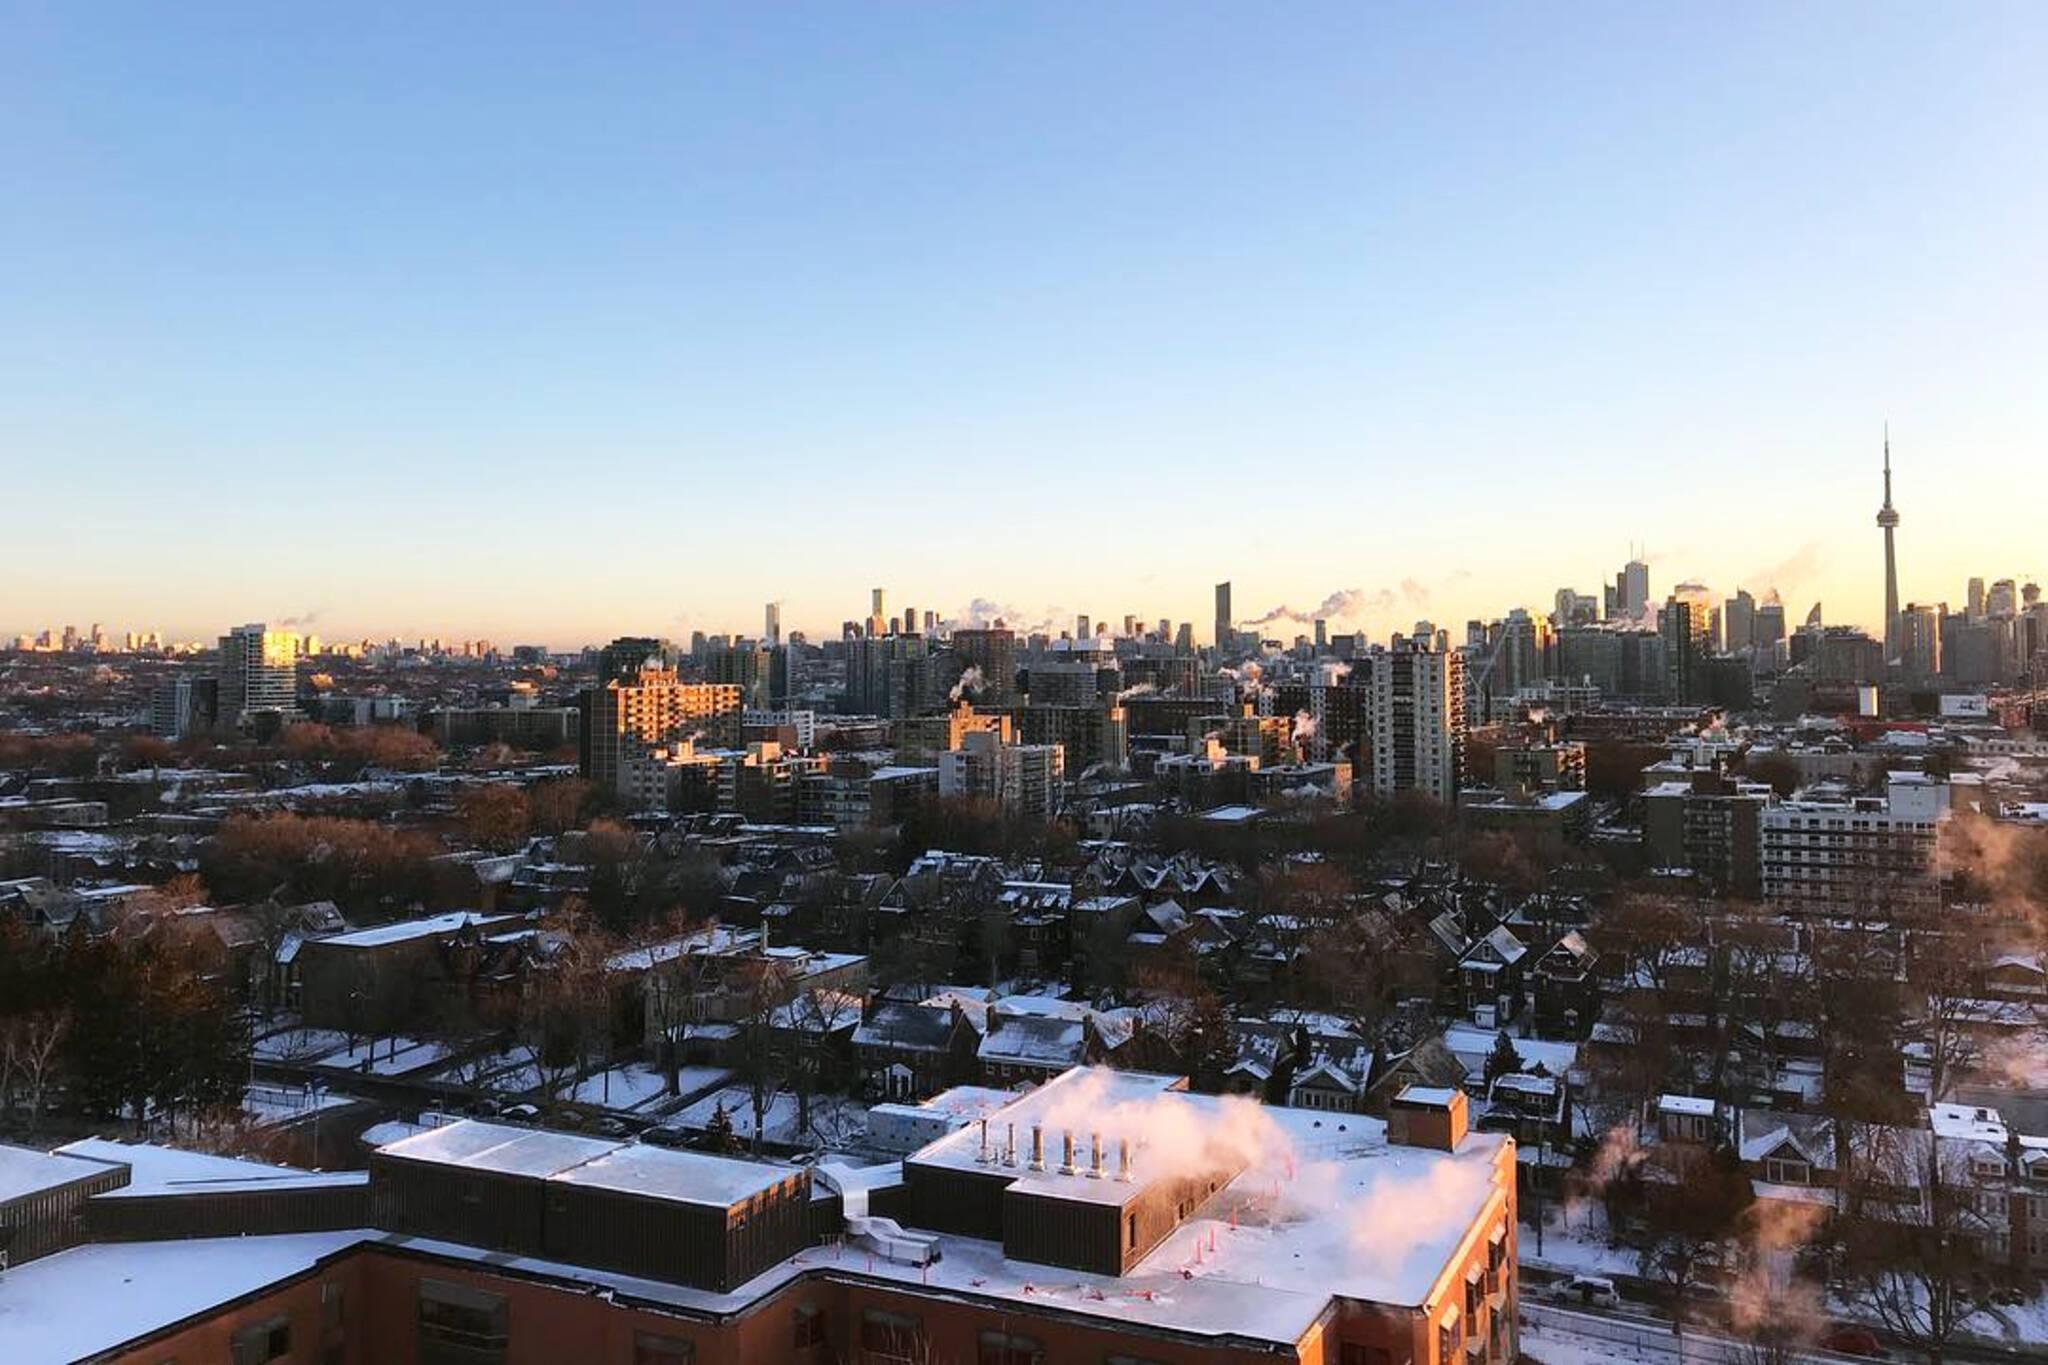 Toronto coldest morning